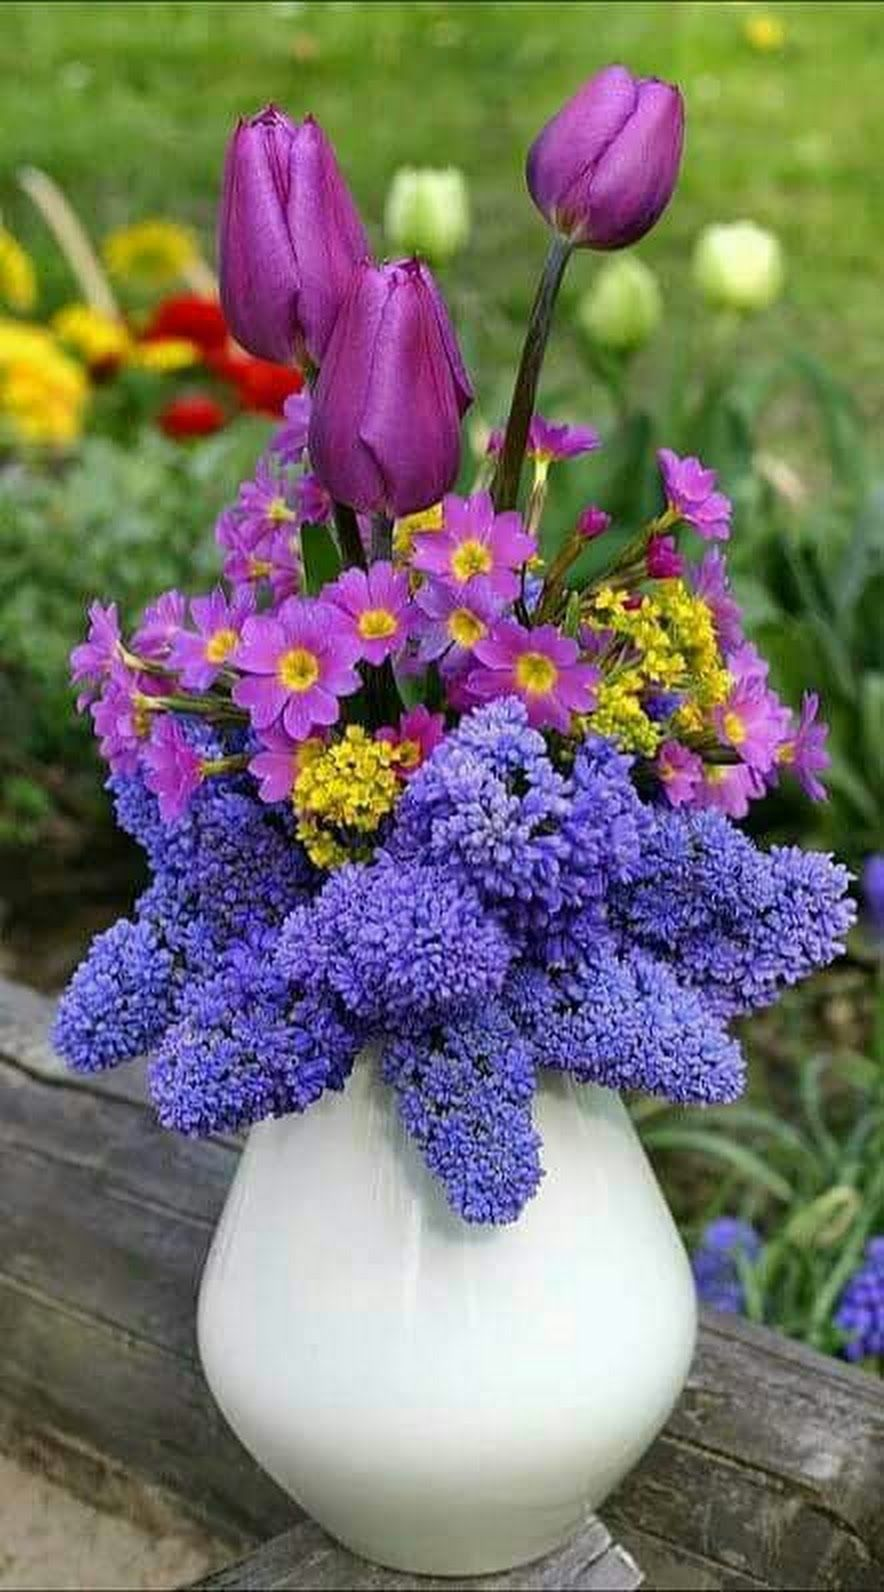 صور ورود رومانسية للاهداء رومانسية صور للاهداء ورود In 2020 Beautiful Flowers Pretty Flowers Tulips Flowers